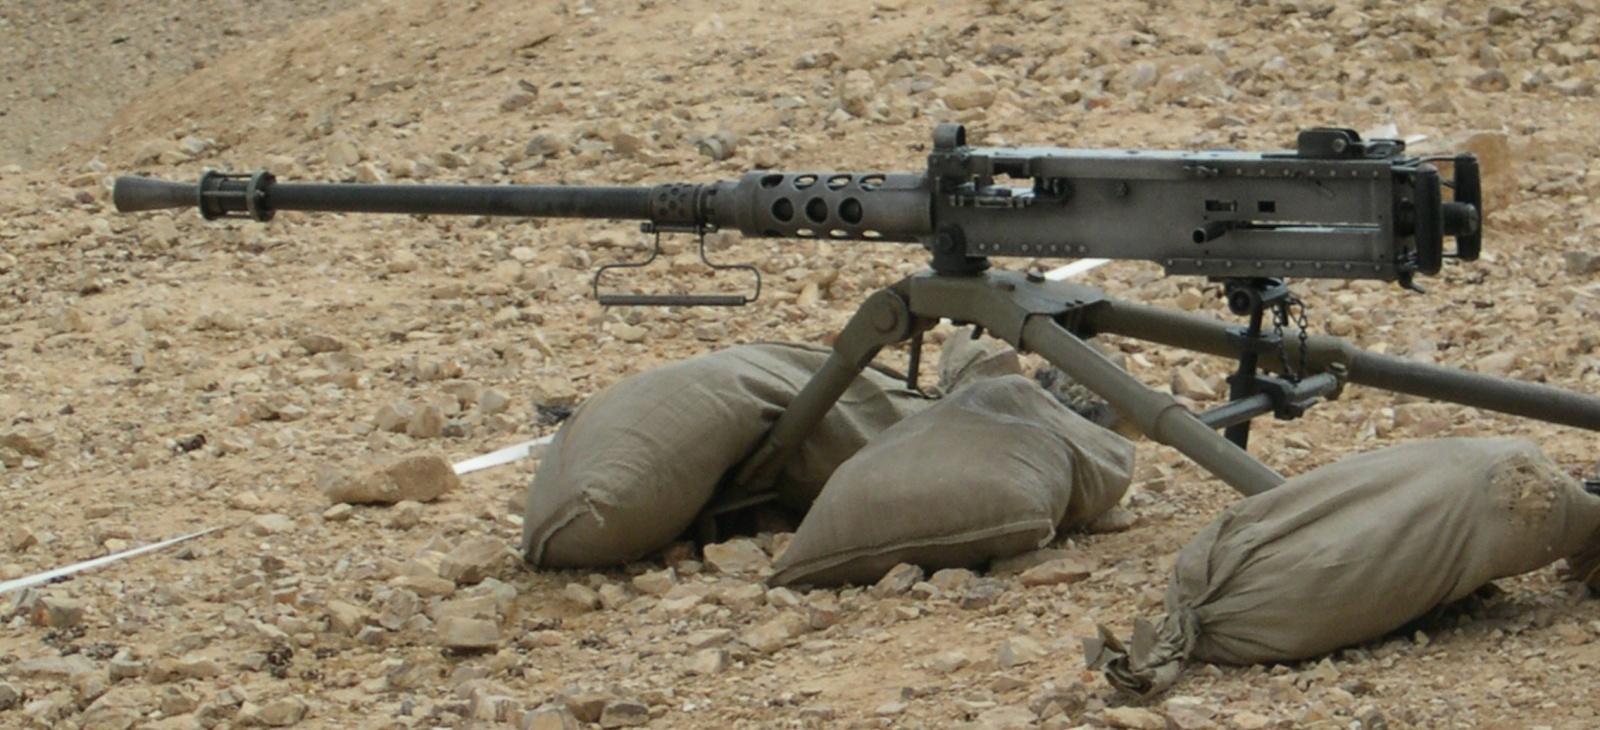 Крупнокалиберные пулеметы «FN-Brownivg» М 2 HQCB  и М 3 (Бельгия)